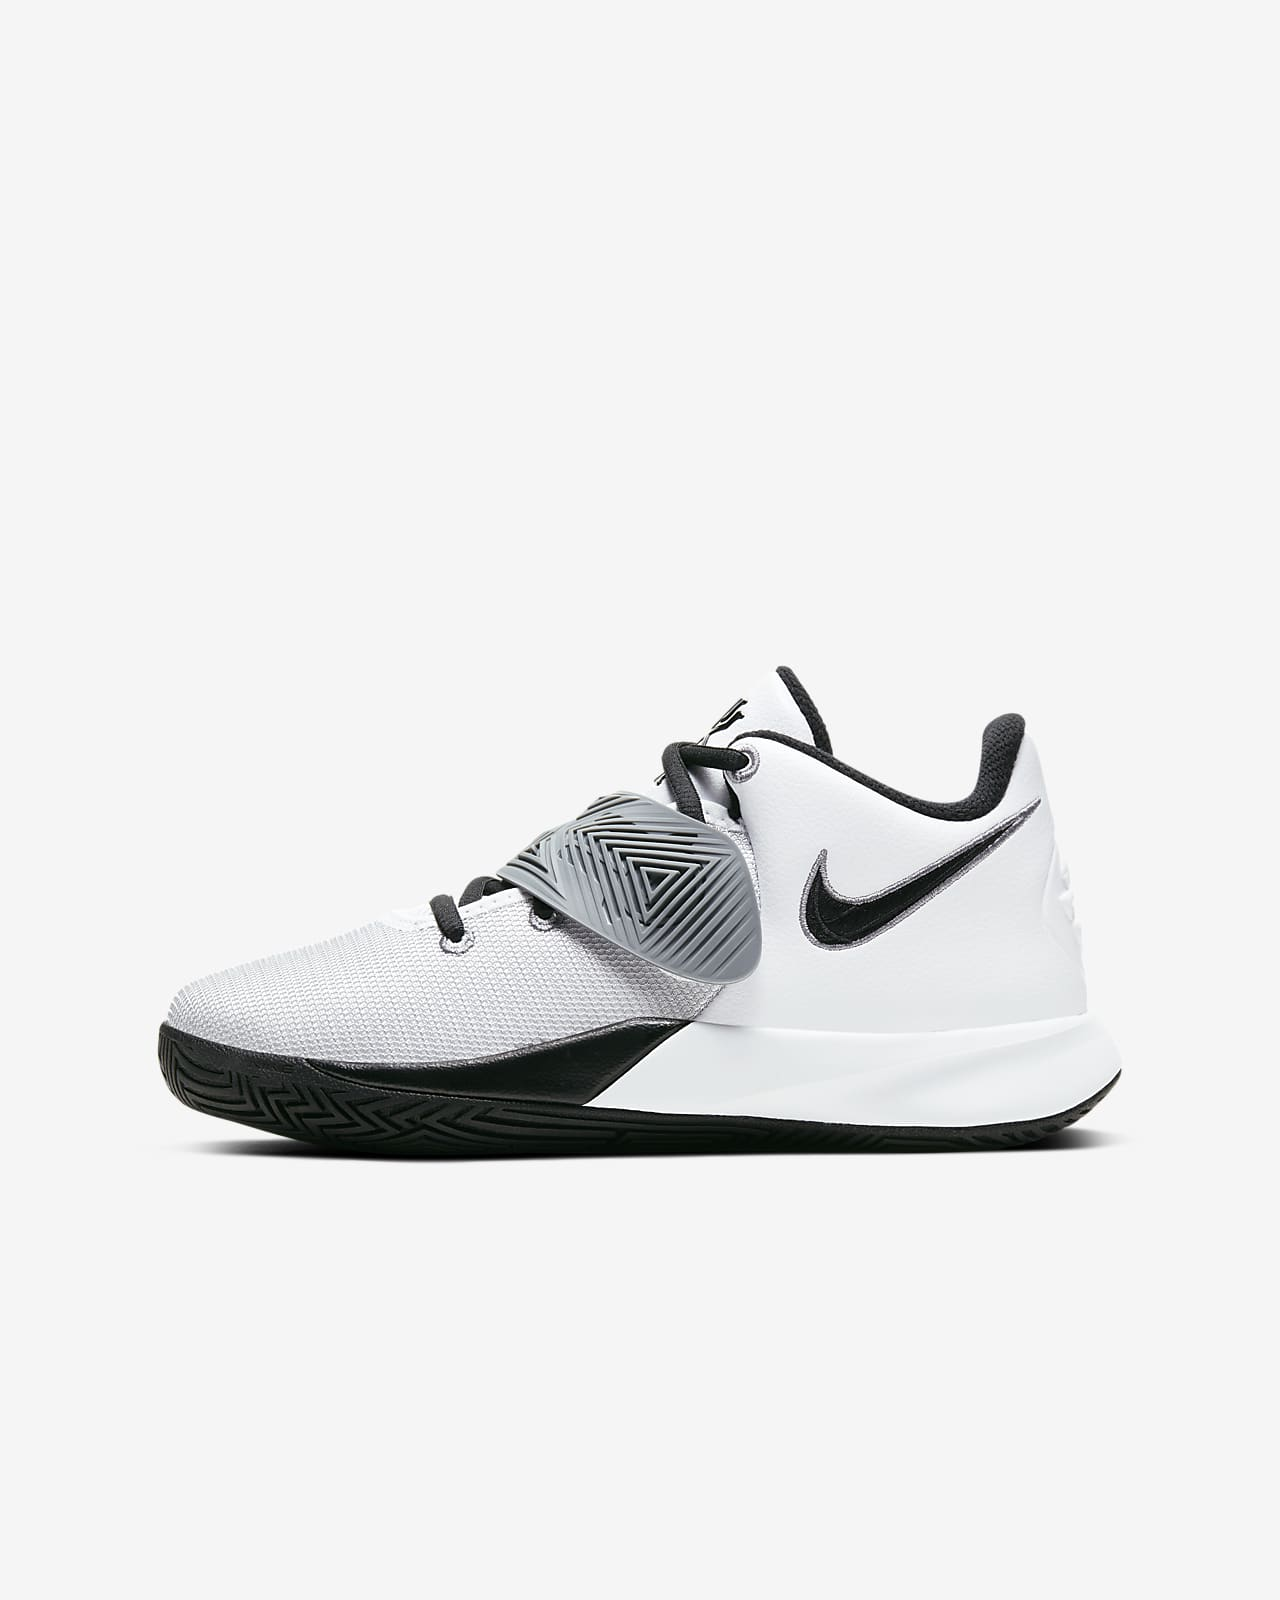 talla grande Kyrie Flytrap 3. Nike